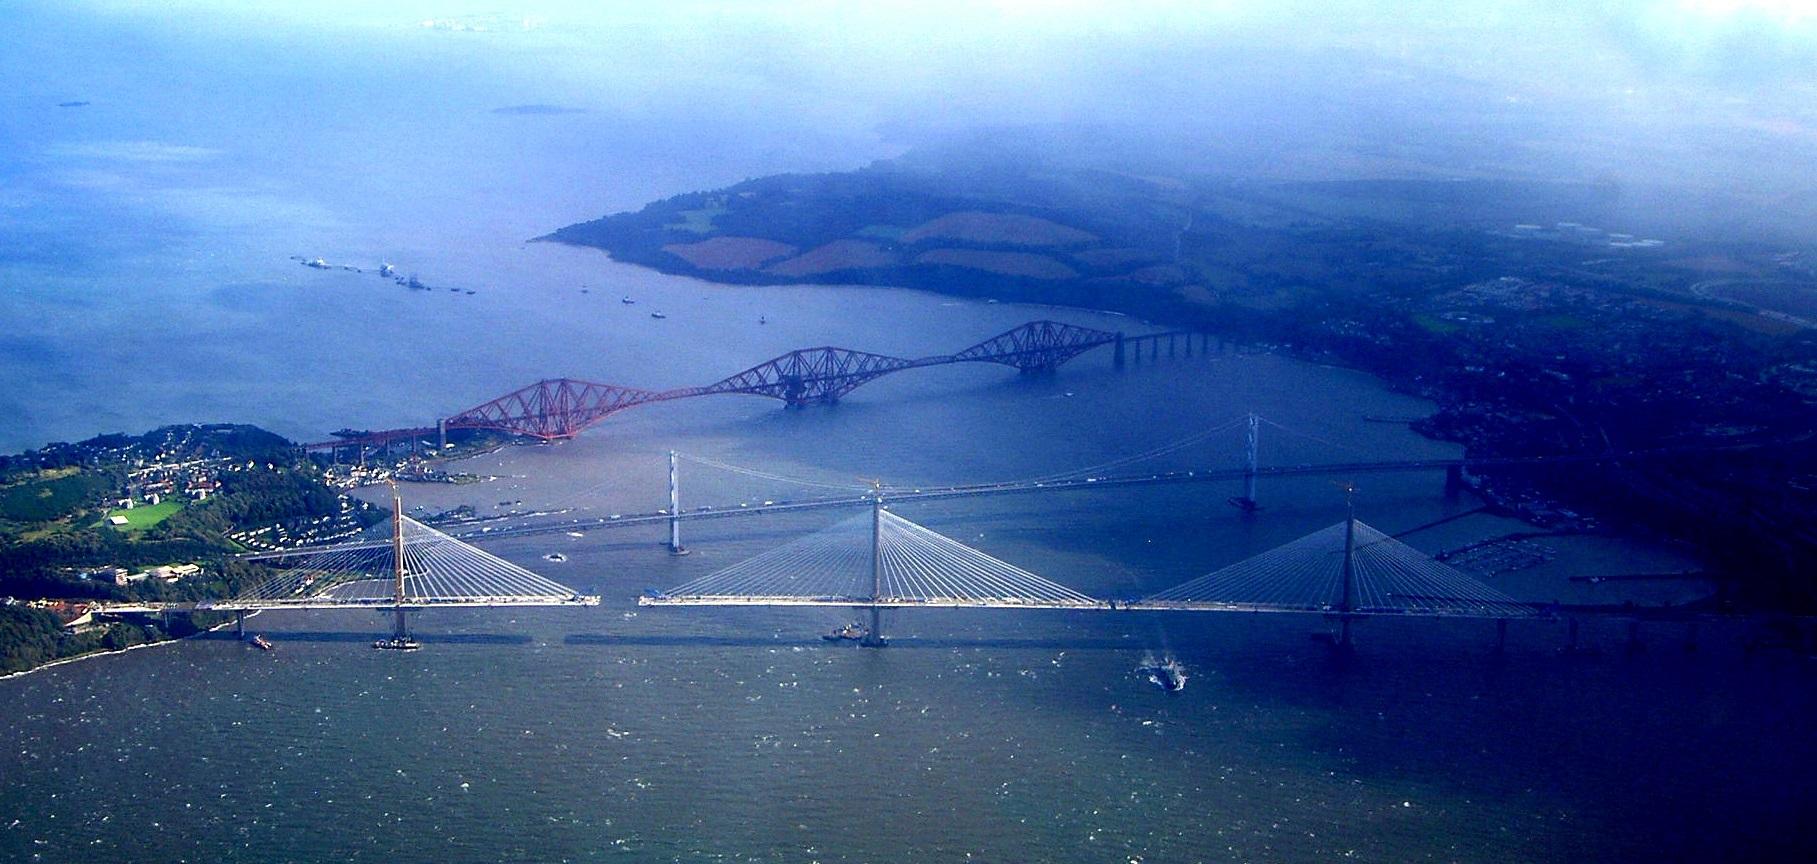 Aerial view of Forth bridges